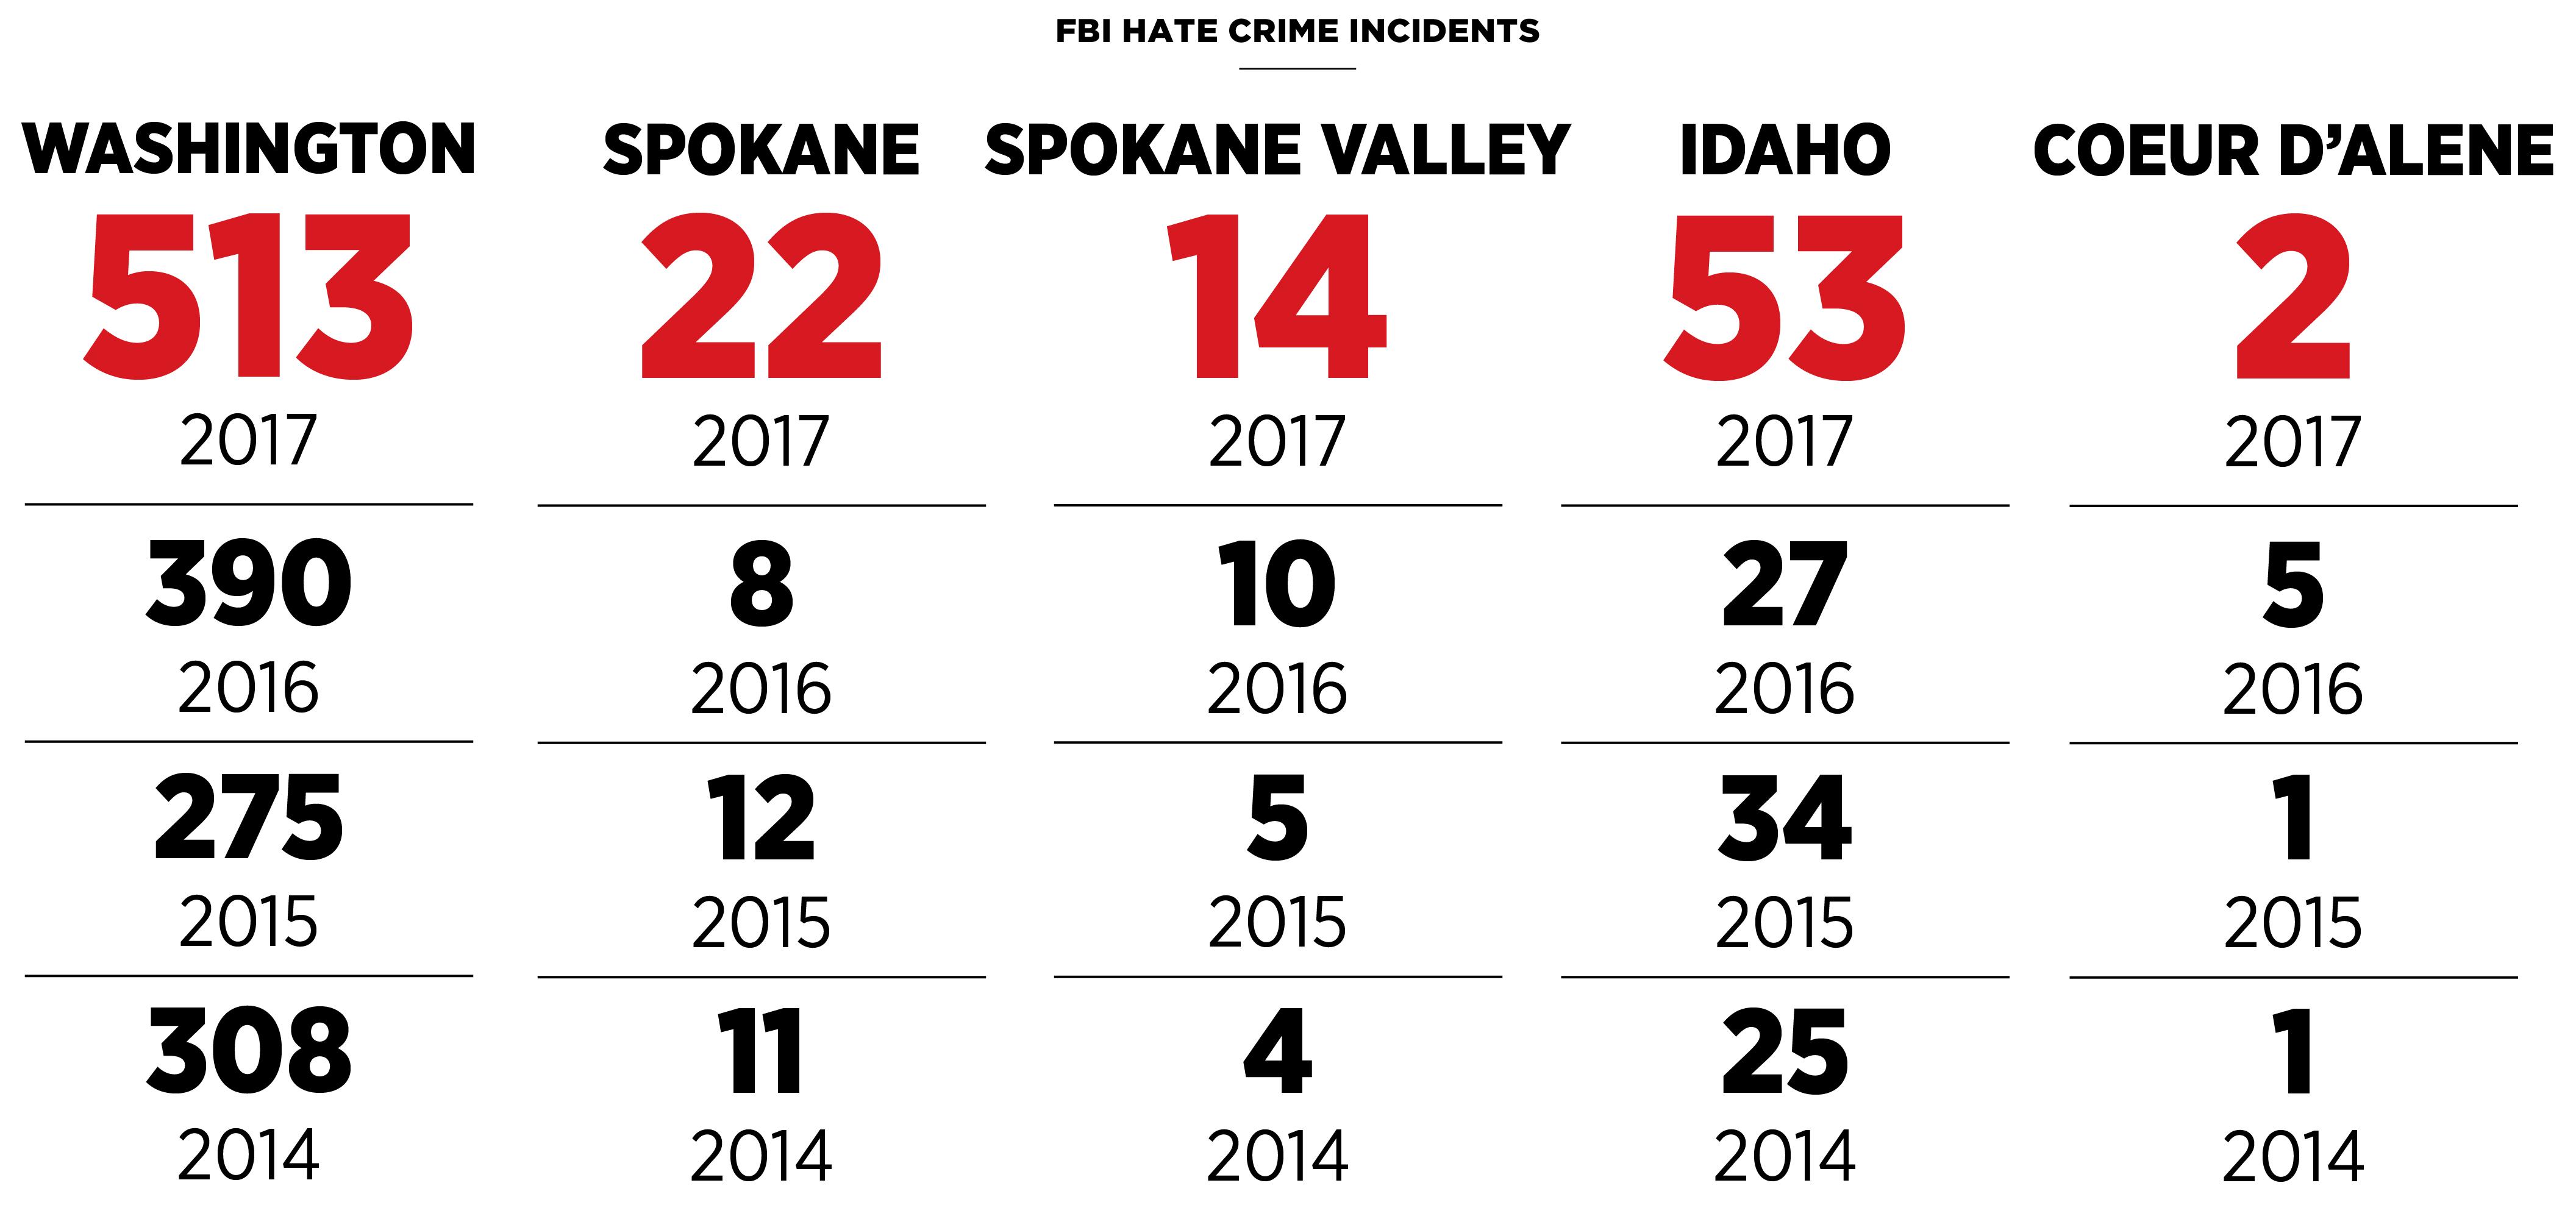 Hate crime reports in Spokane spike in 2017 | The Spokesman